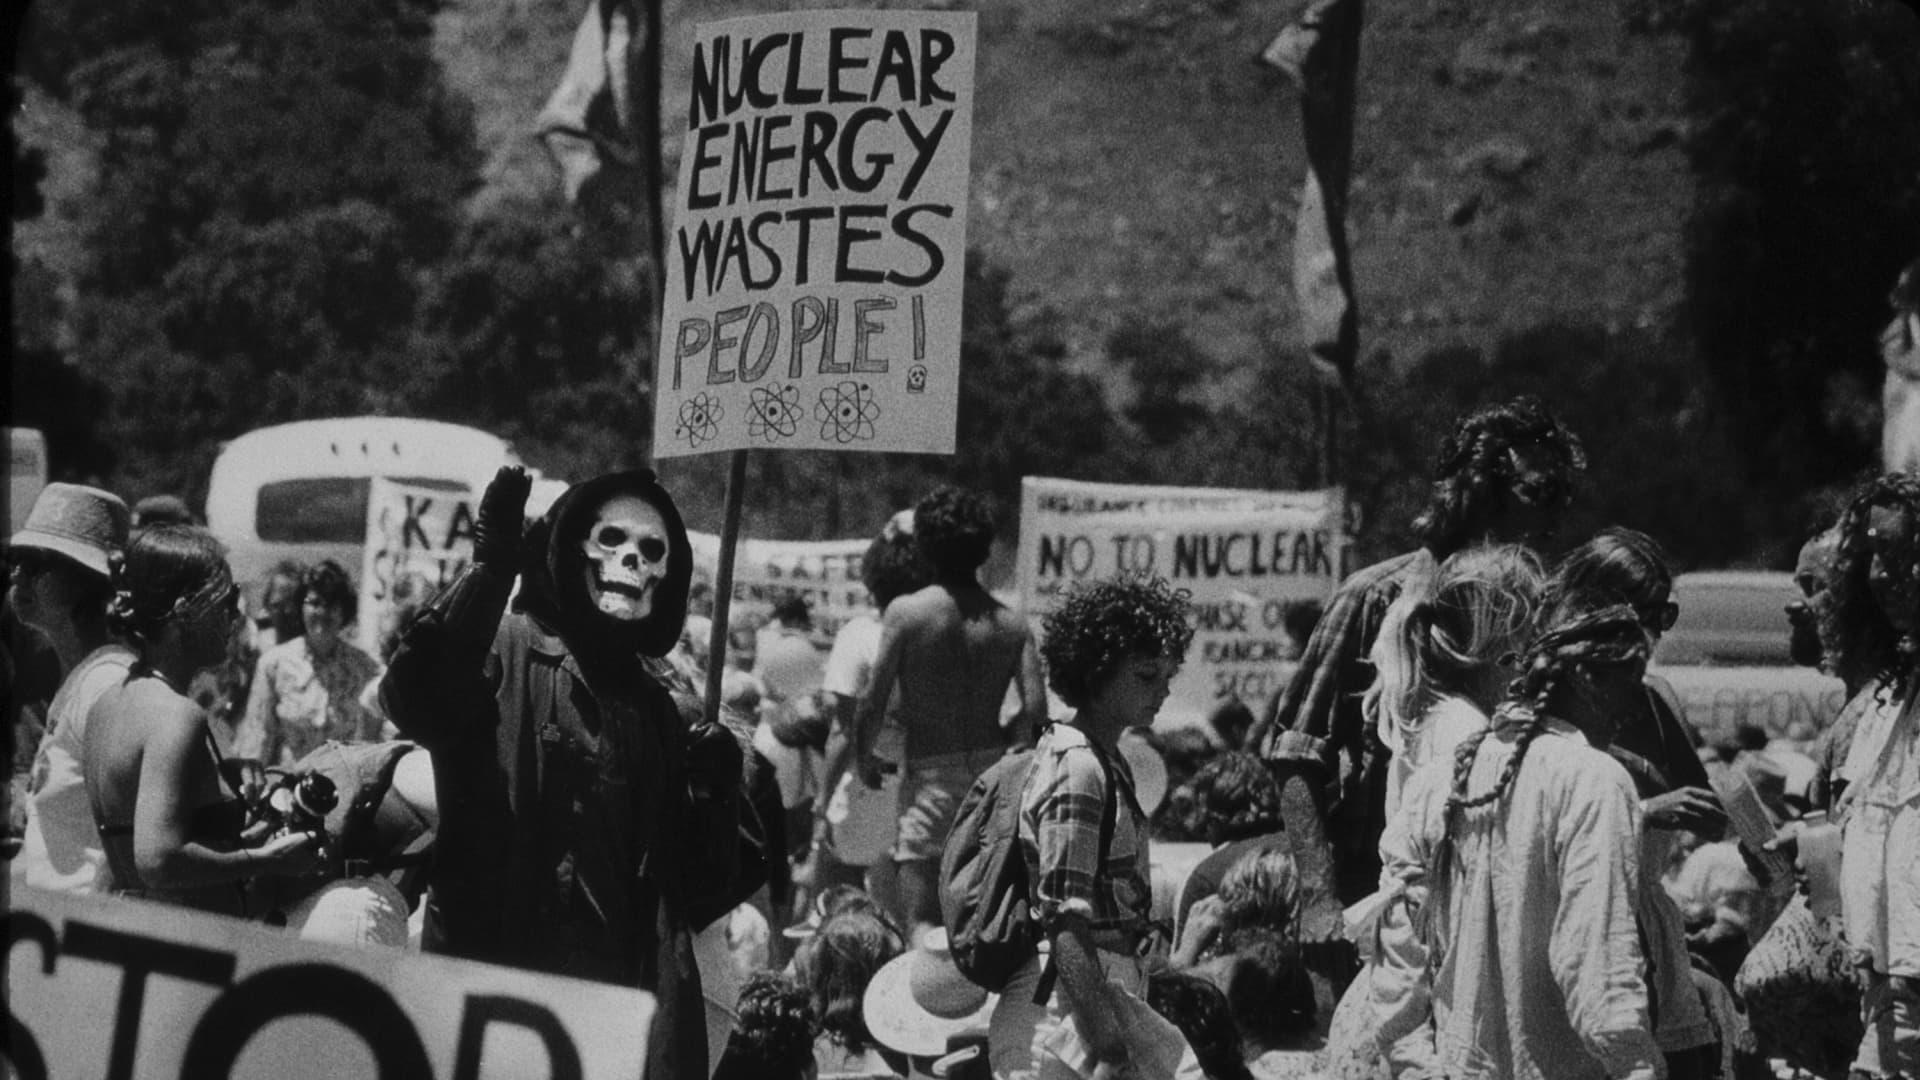 SAN LUIS OBISPO, CALIFORNIA -JUNE 30: Anti nuclear supporters at Diablo Canyon anti-nuclear protest, June 30, 1979 in San Luis Obispo, California. (Photo by Getty Images/Bob Riha, Jr.)